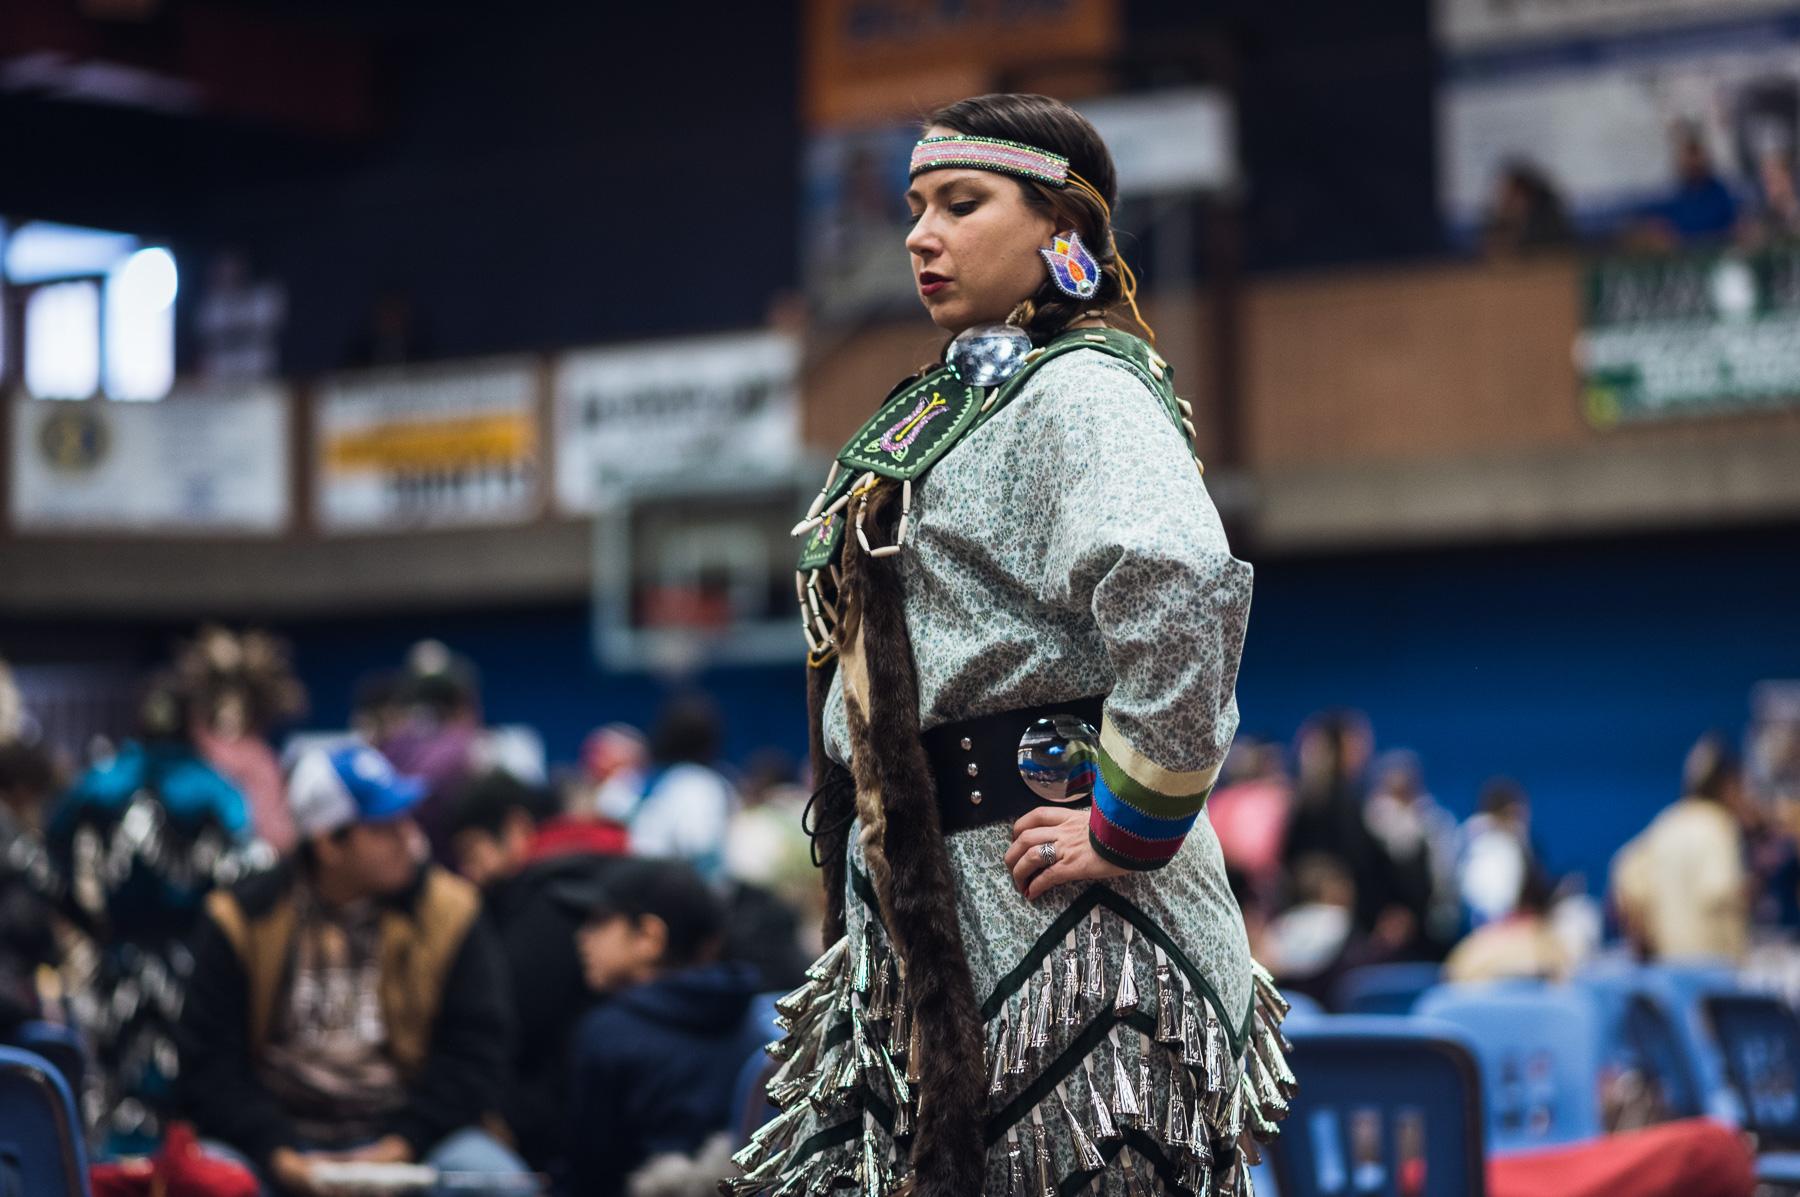 31st-Annual-LUNSA-Powwow-Blog-76.jpg